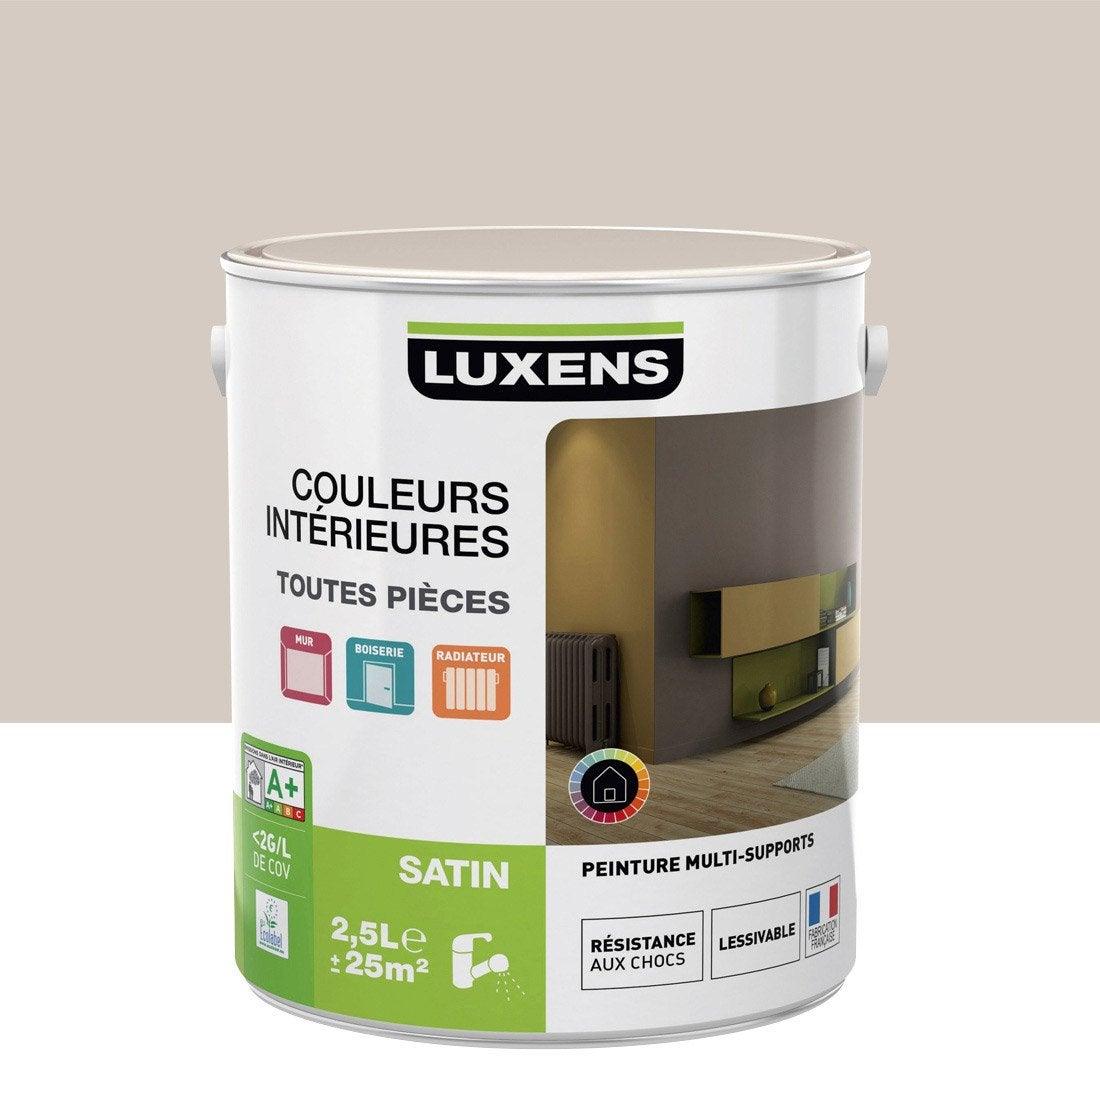 Peinture gris dor 6 luxens couleurs int rieures satin 2 5 - Peinture leroy merlin luxens ...